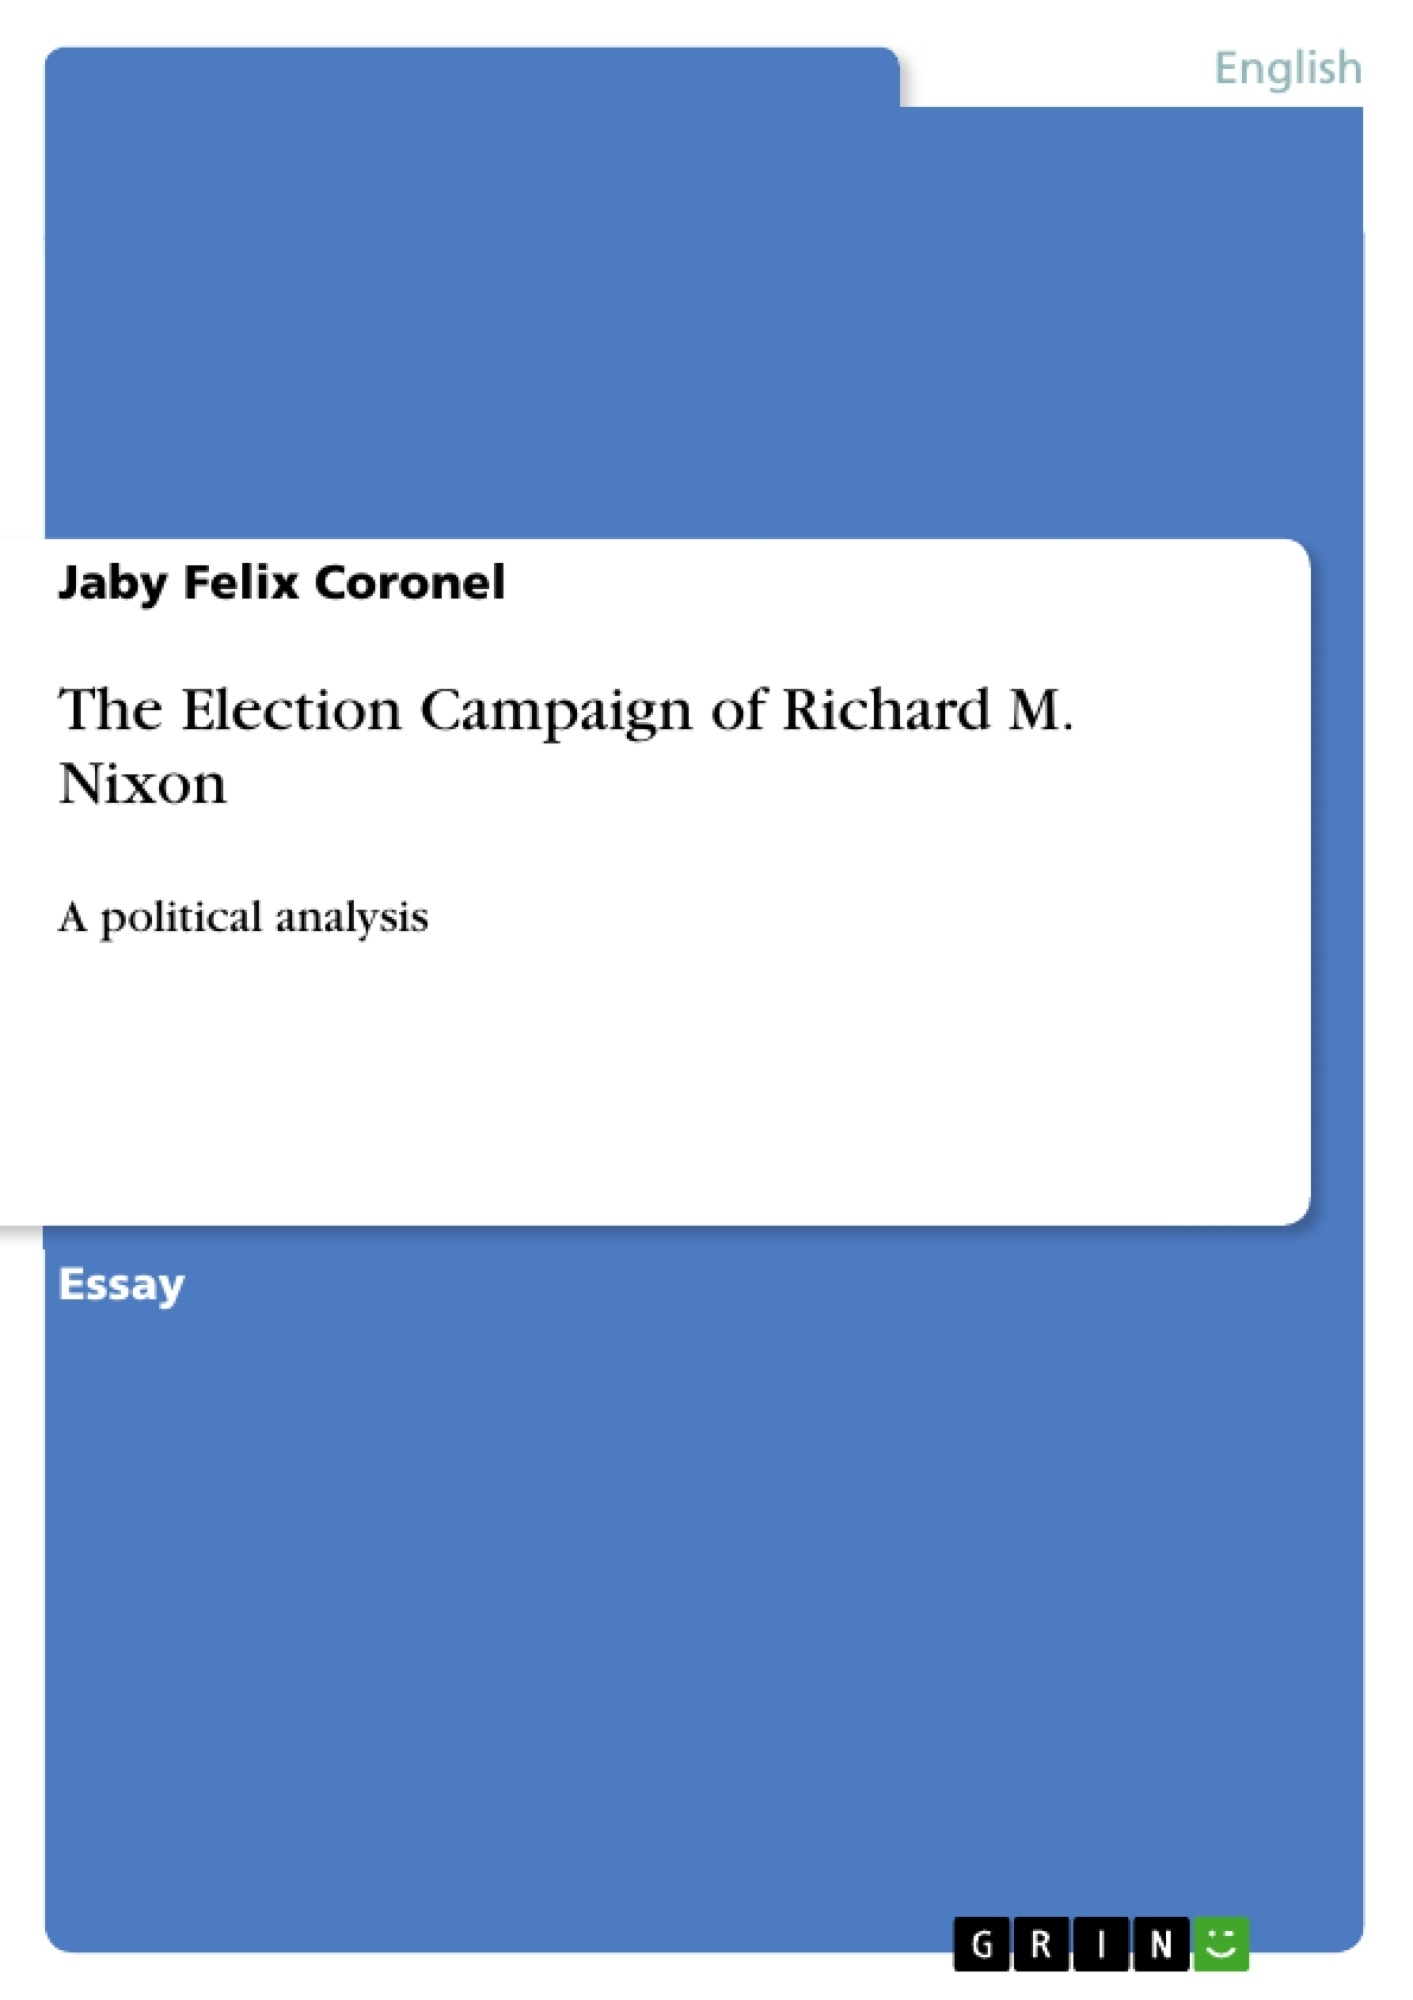 Title: The Election Campaign of Richard M. Nixon